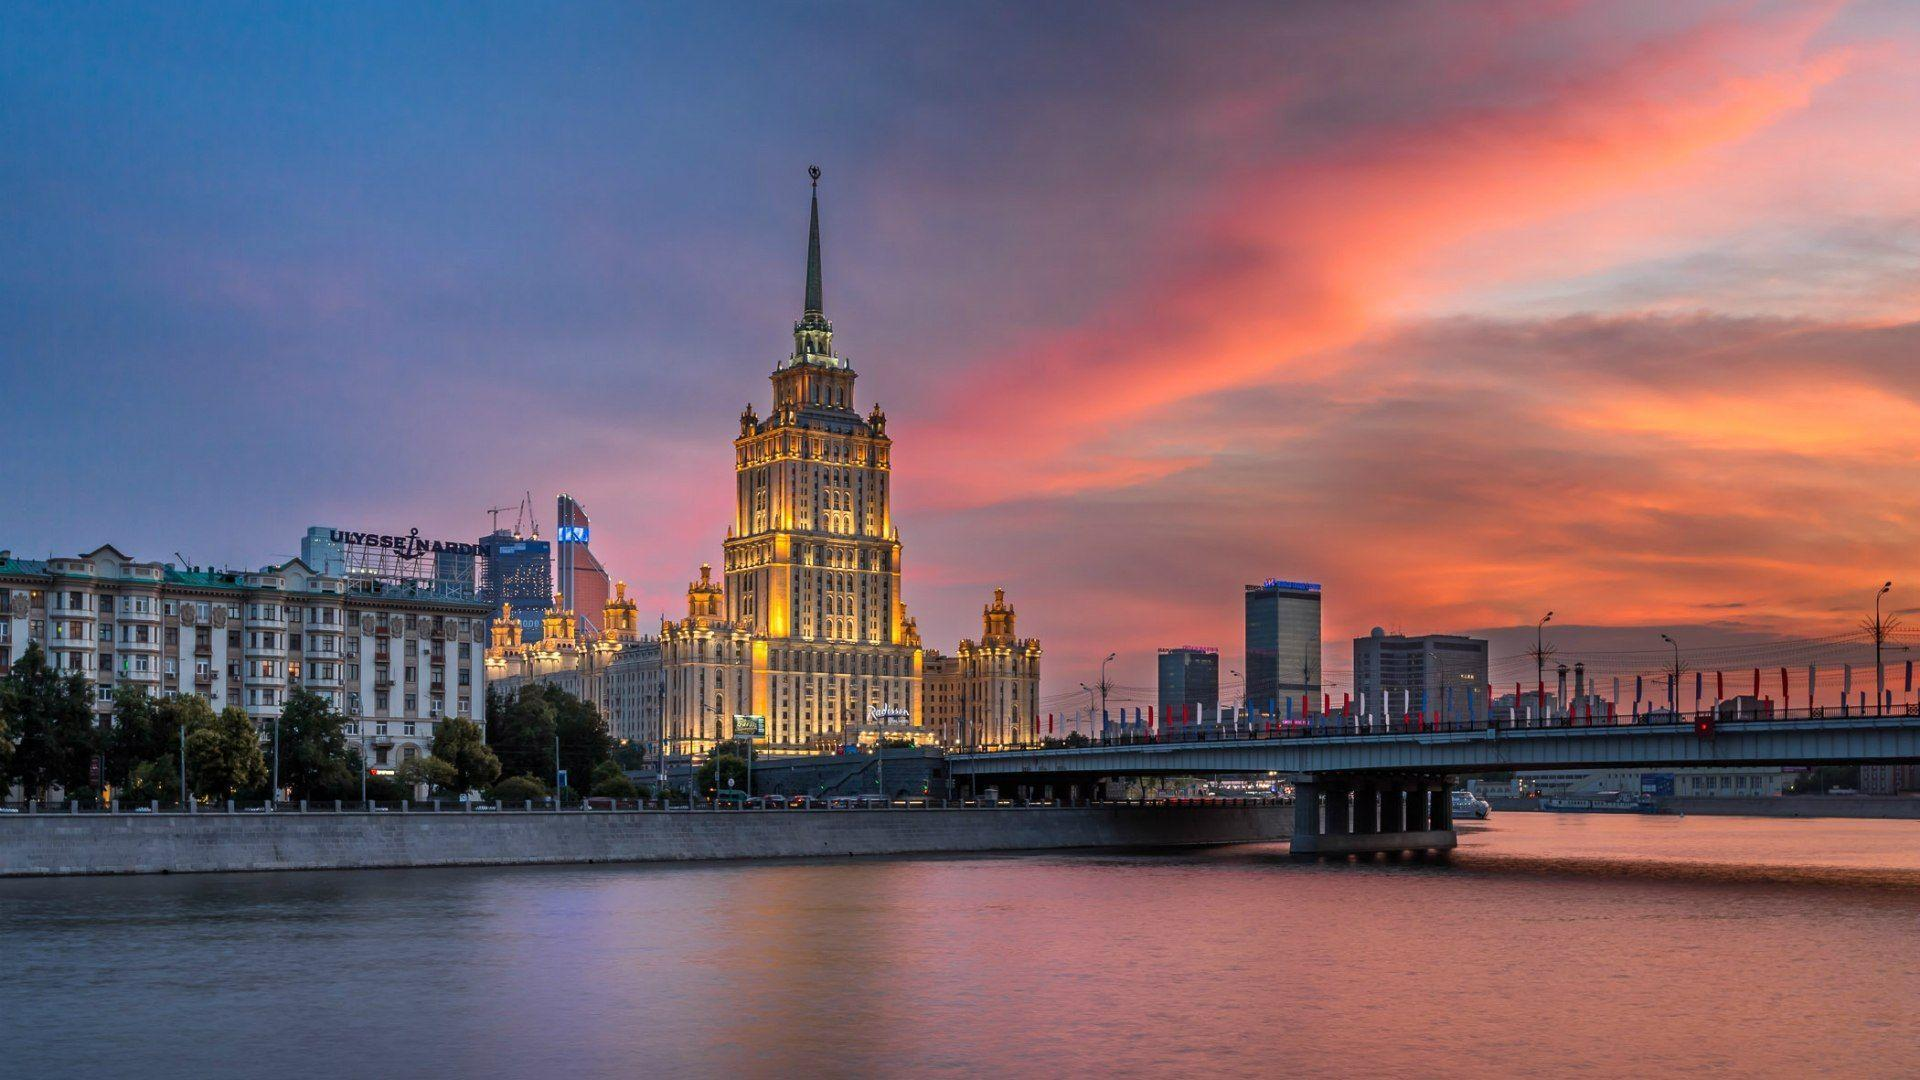 Hotel Ukraine Moscow - wallpaper.